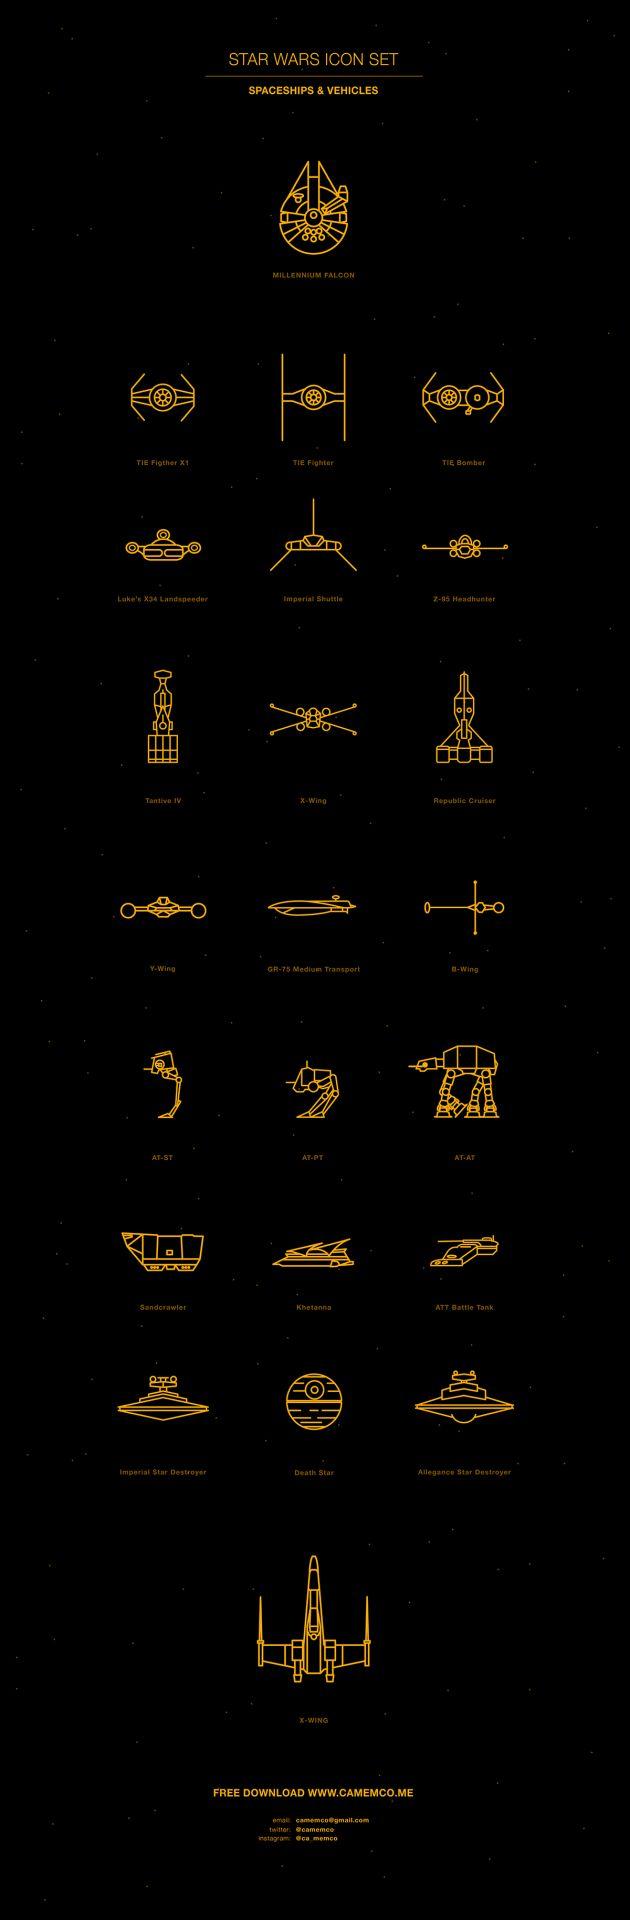 Star Wars Vectors | Carolina Mem Correa de Sa | #ilustração #illustration #artedigital #digitalart #starwars #geek